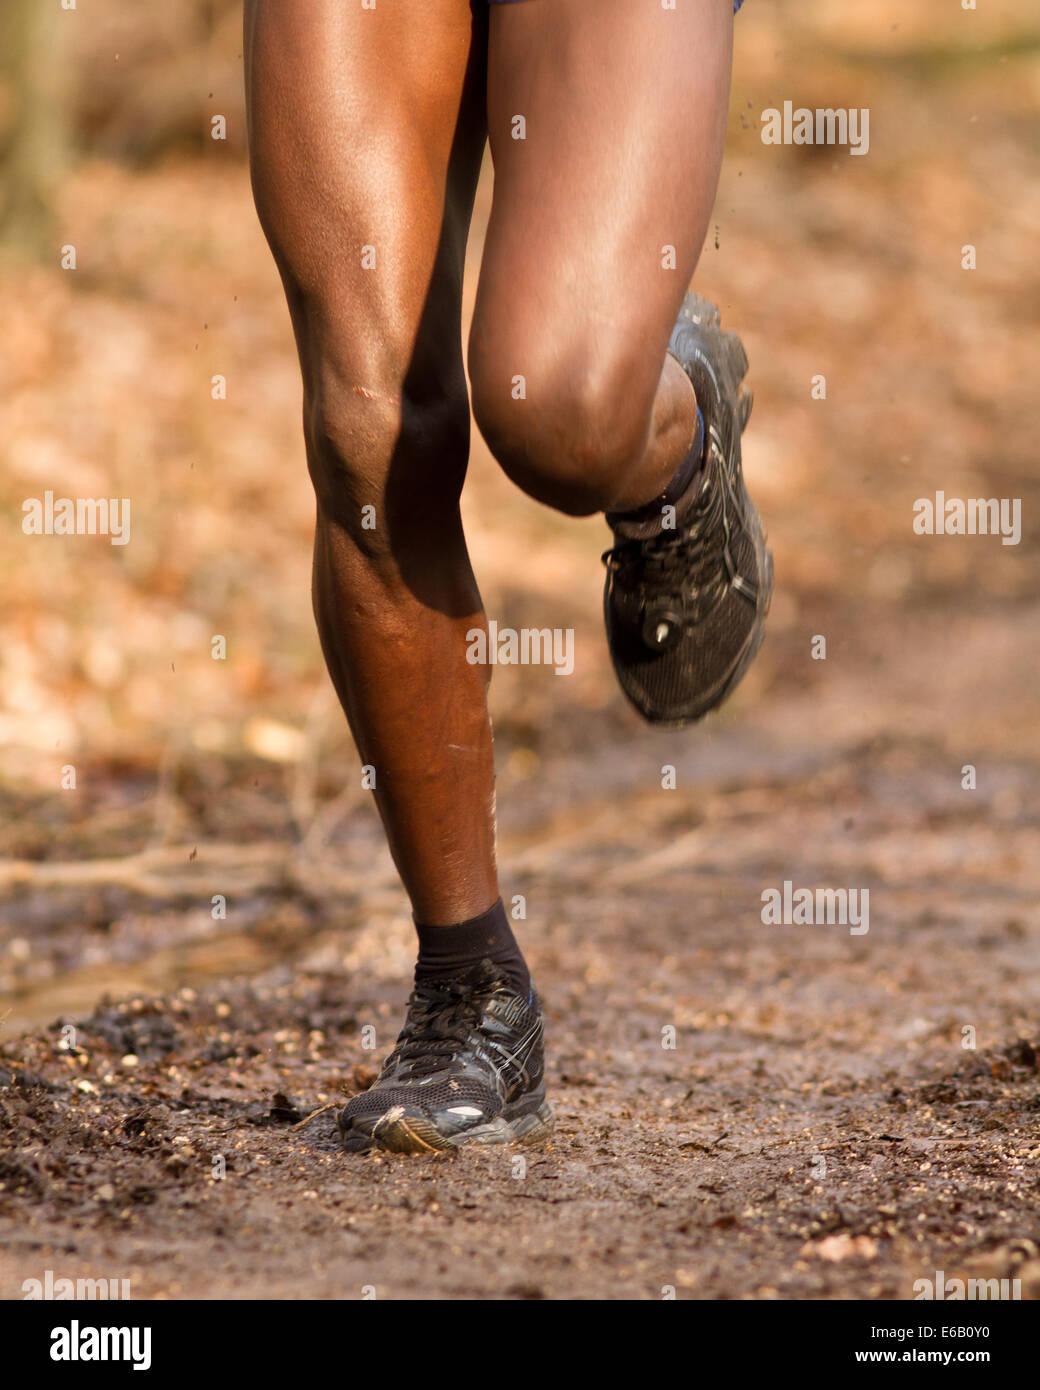 sports,fitness,legs,running,cross running - Stock Image